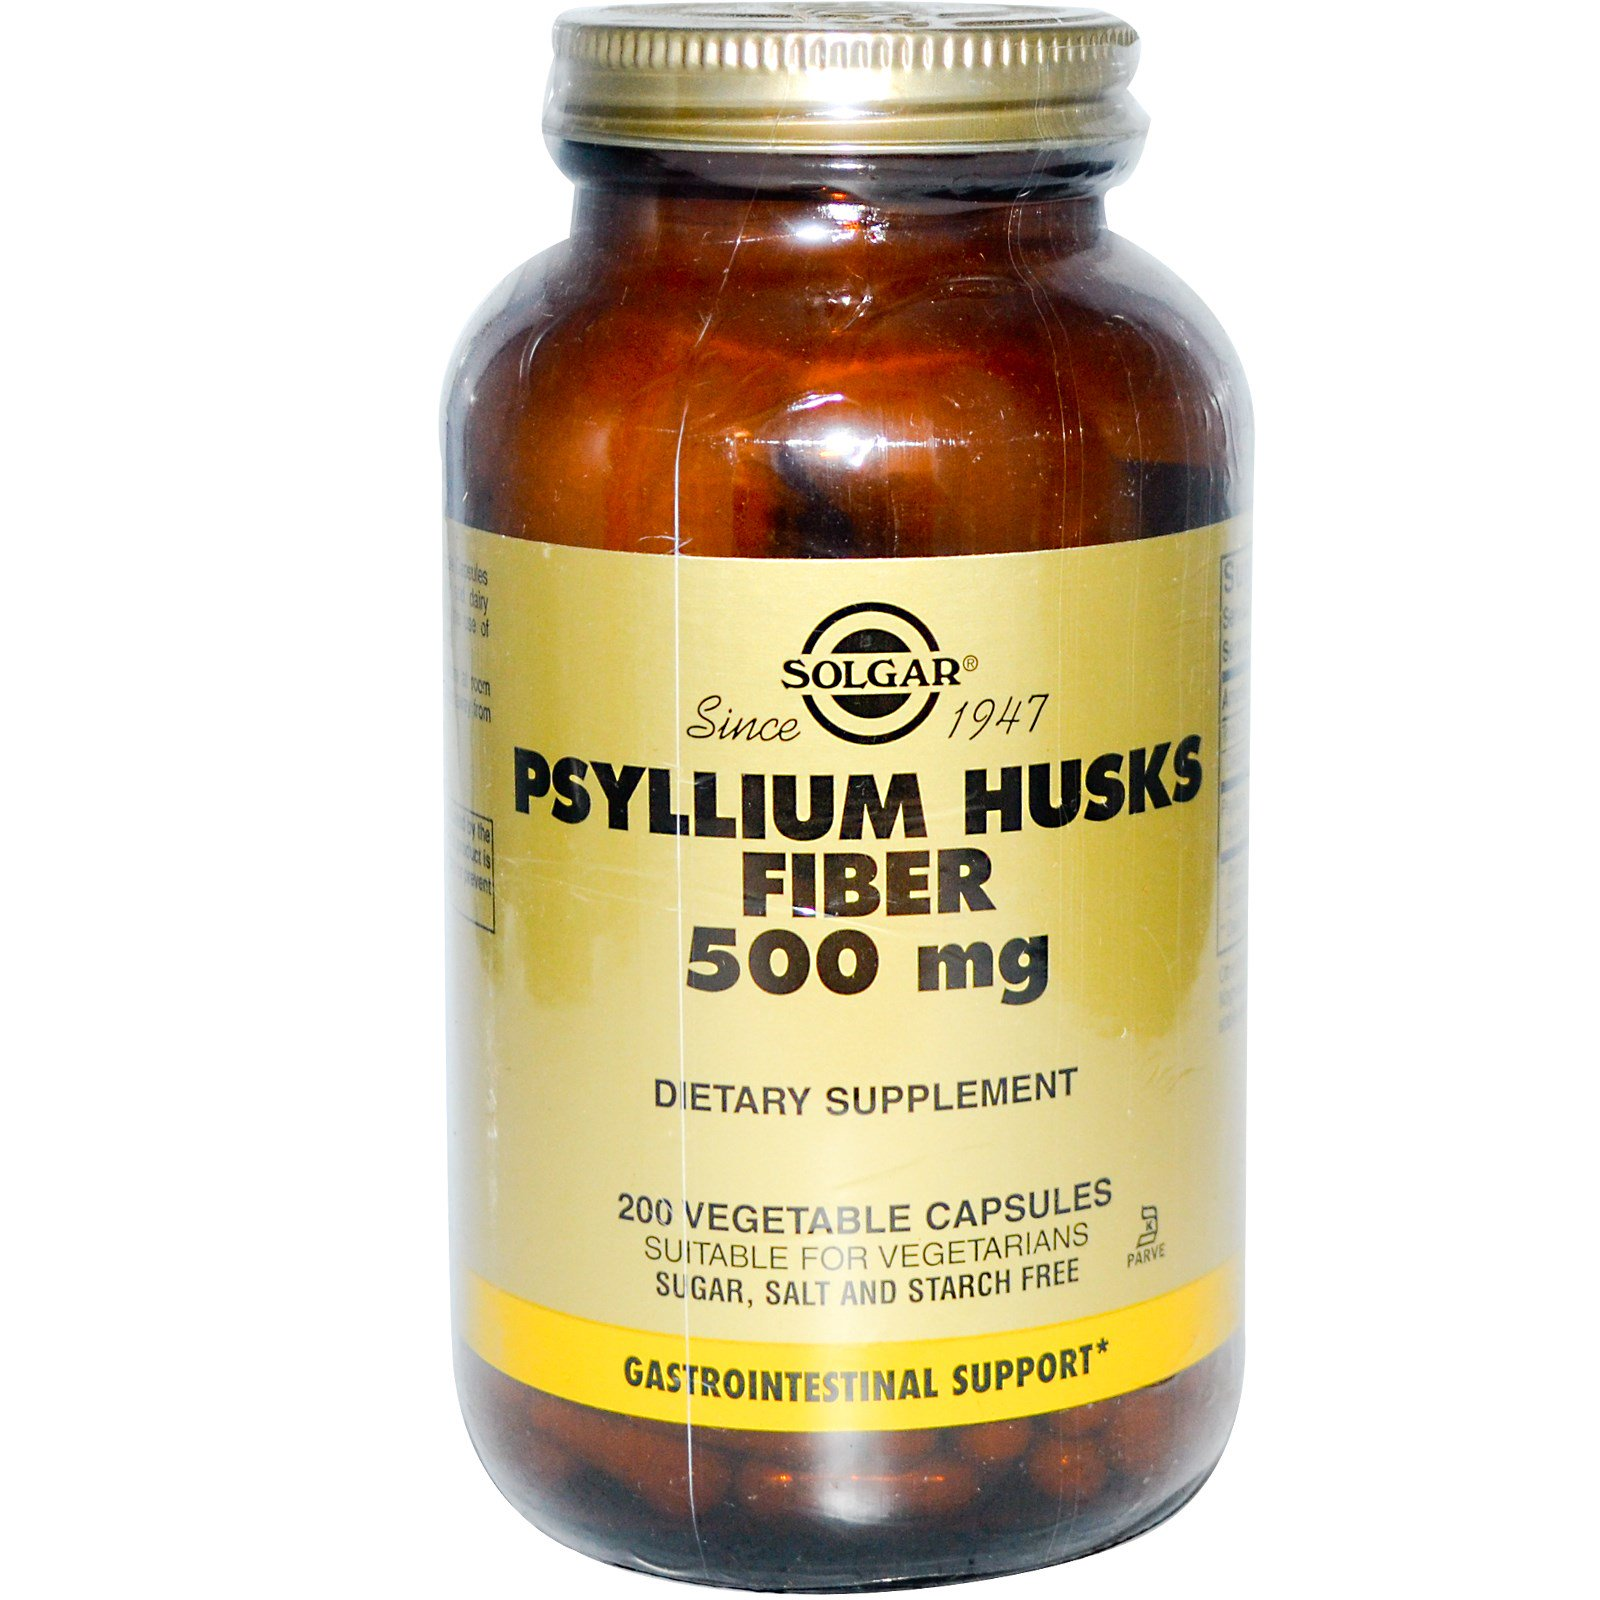 Fiber husk psyllium